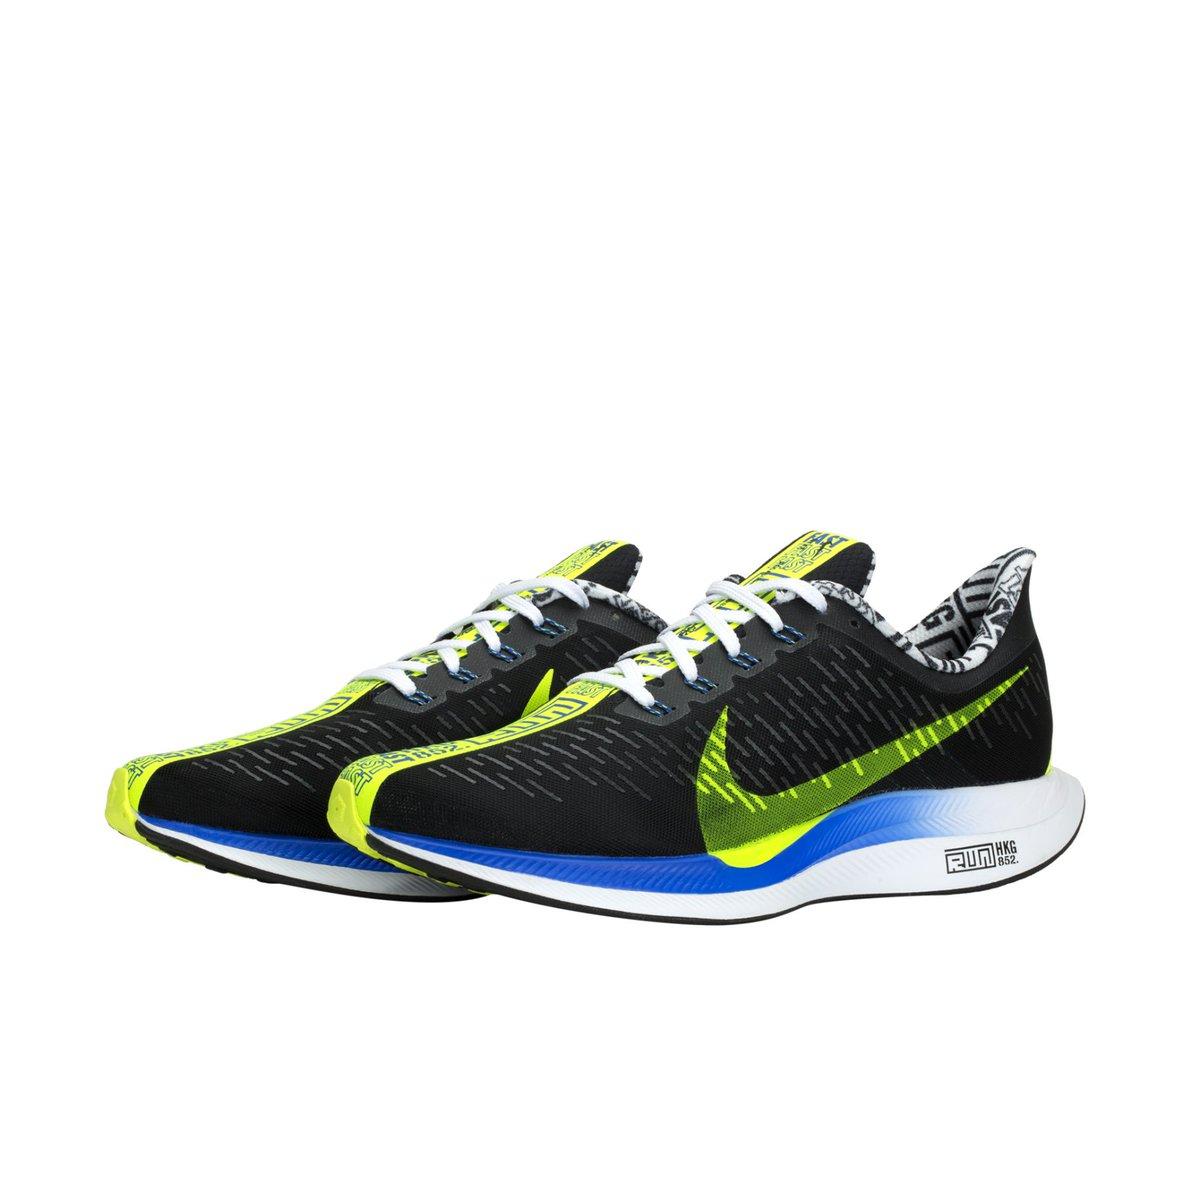 "5a961e25dc341 An official look at the Nike Zoom Pegasus 35 Turbo GC ""Hong Kong Marathon  2019""pic.twitter.com UH4sLZX8w7"